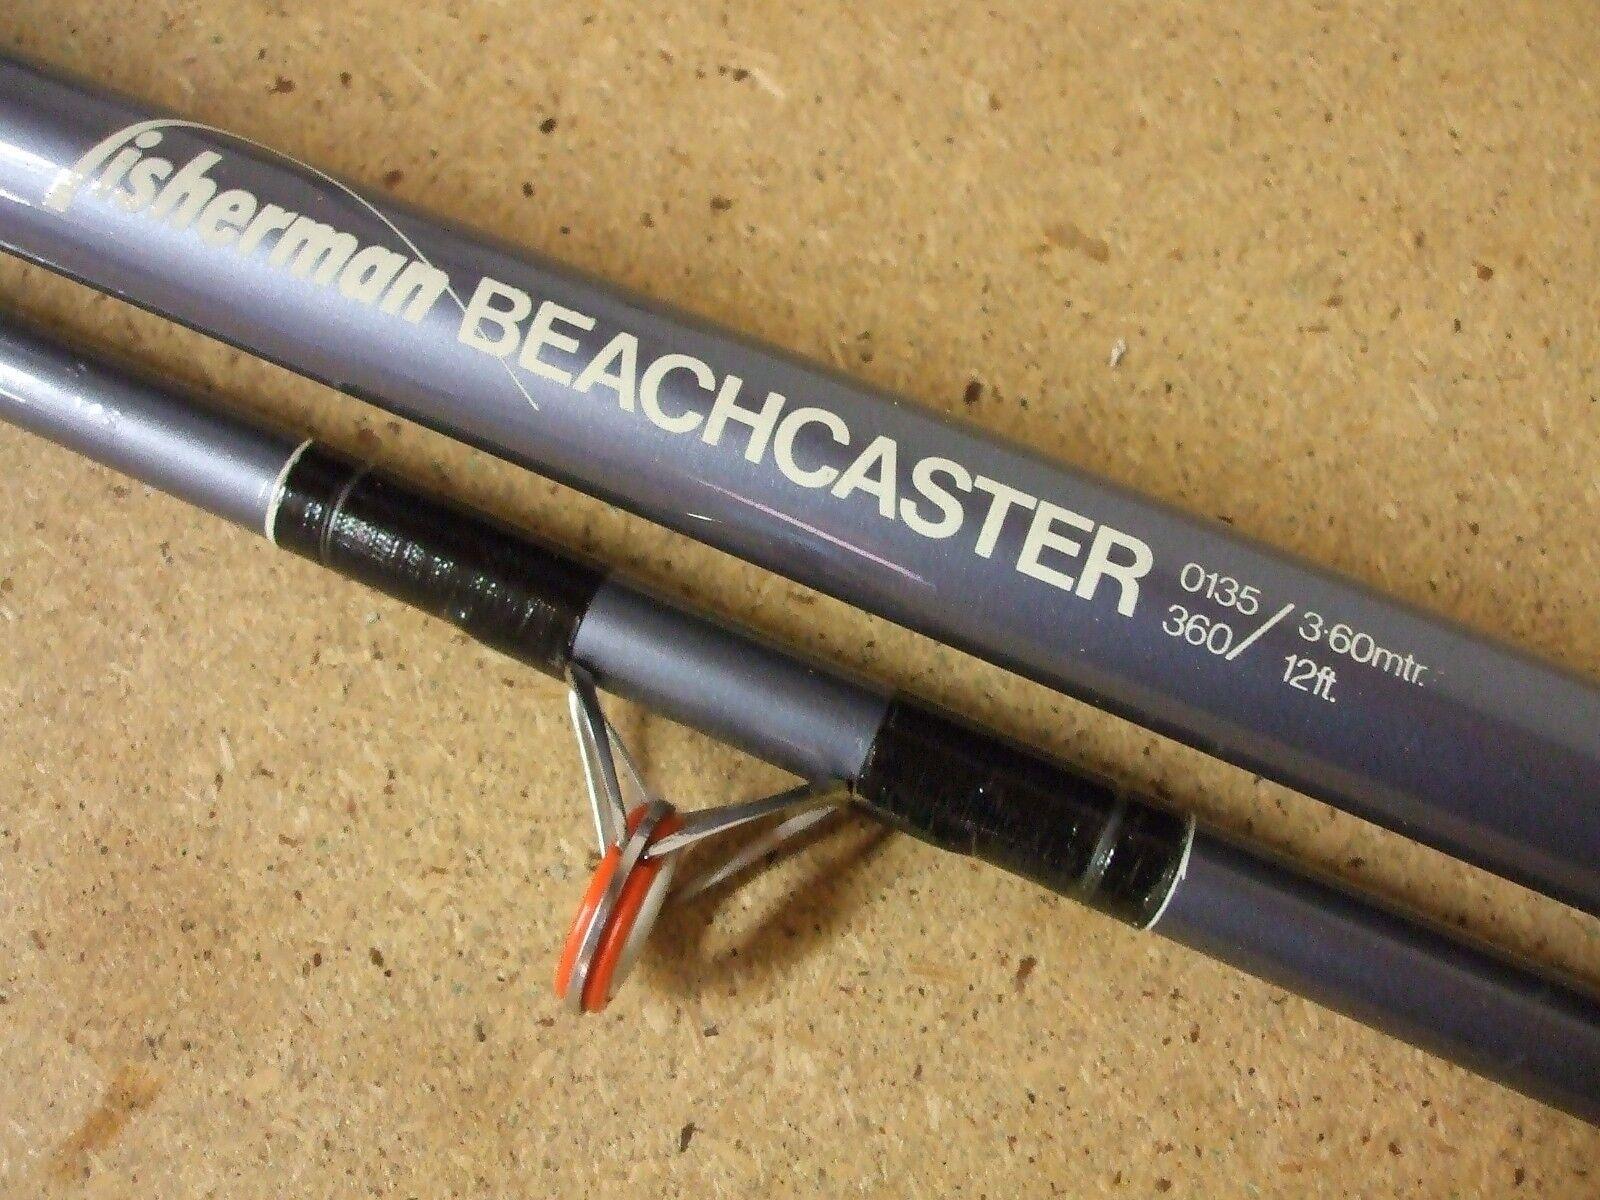 Fisherman 12' Beechcaster rod BEAUTIFUL